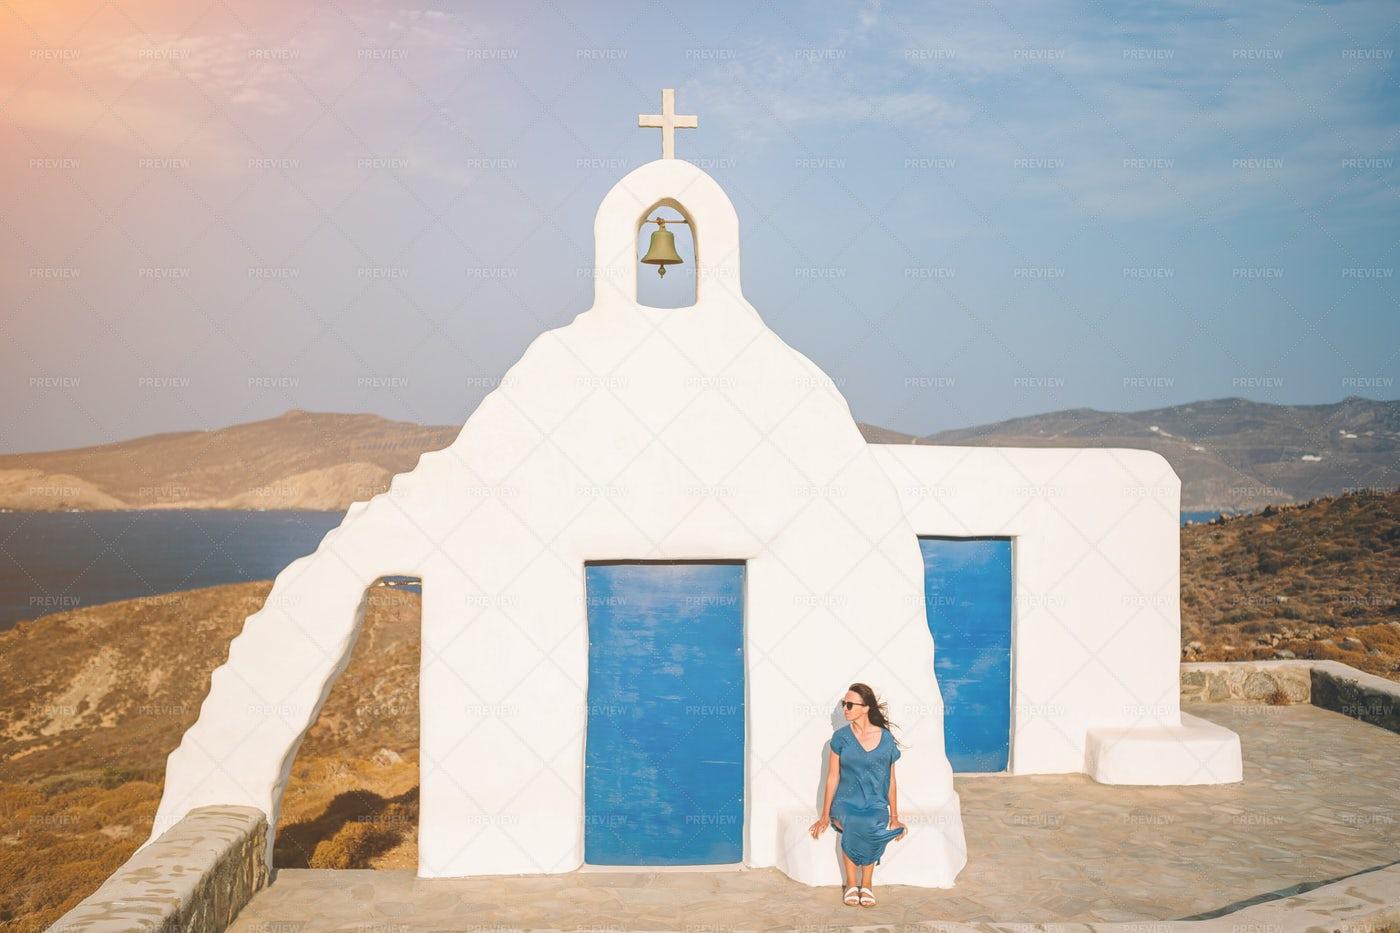 Beside The White Church: Stock Photos